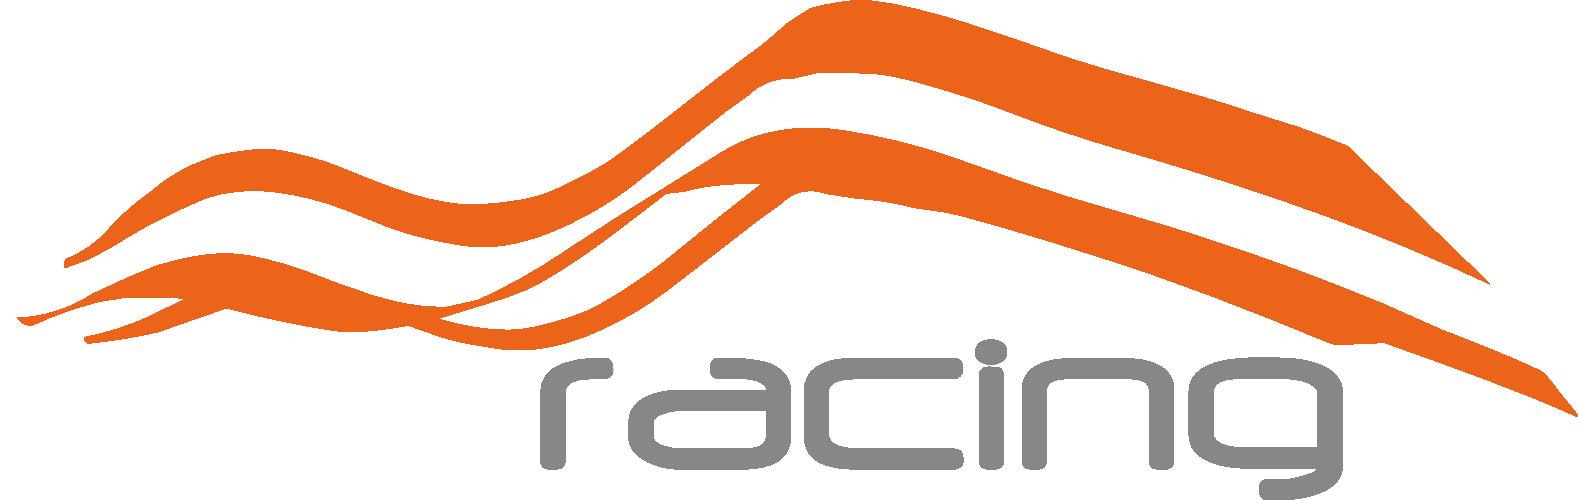 evo-racing